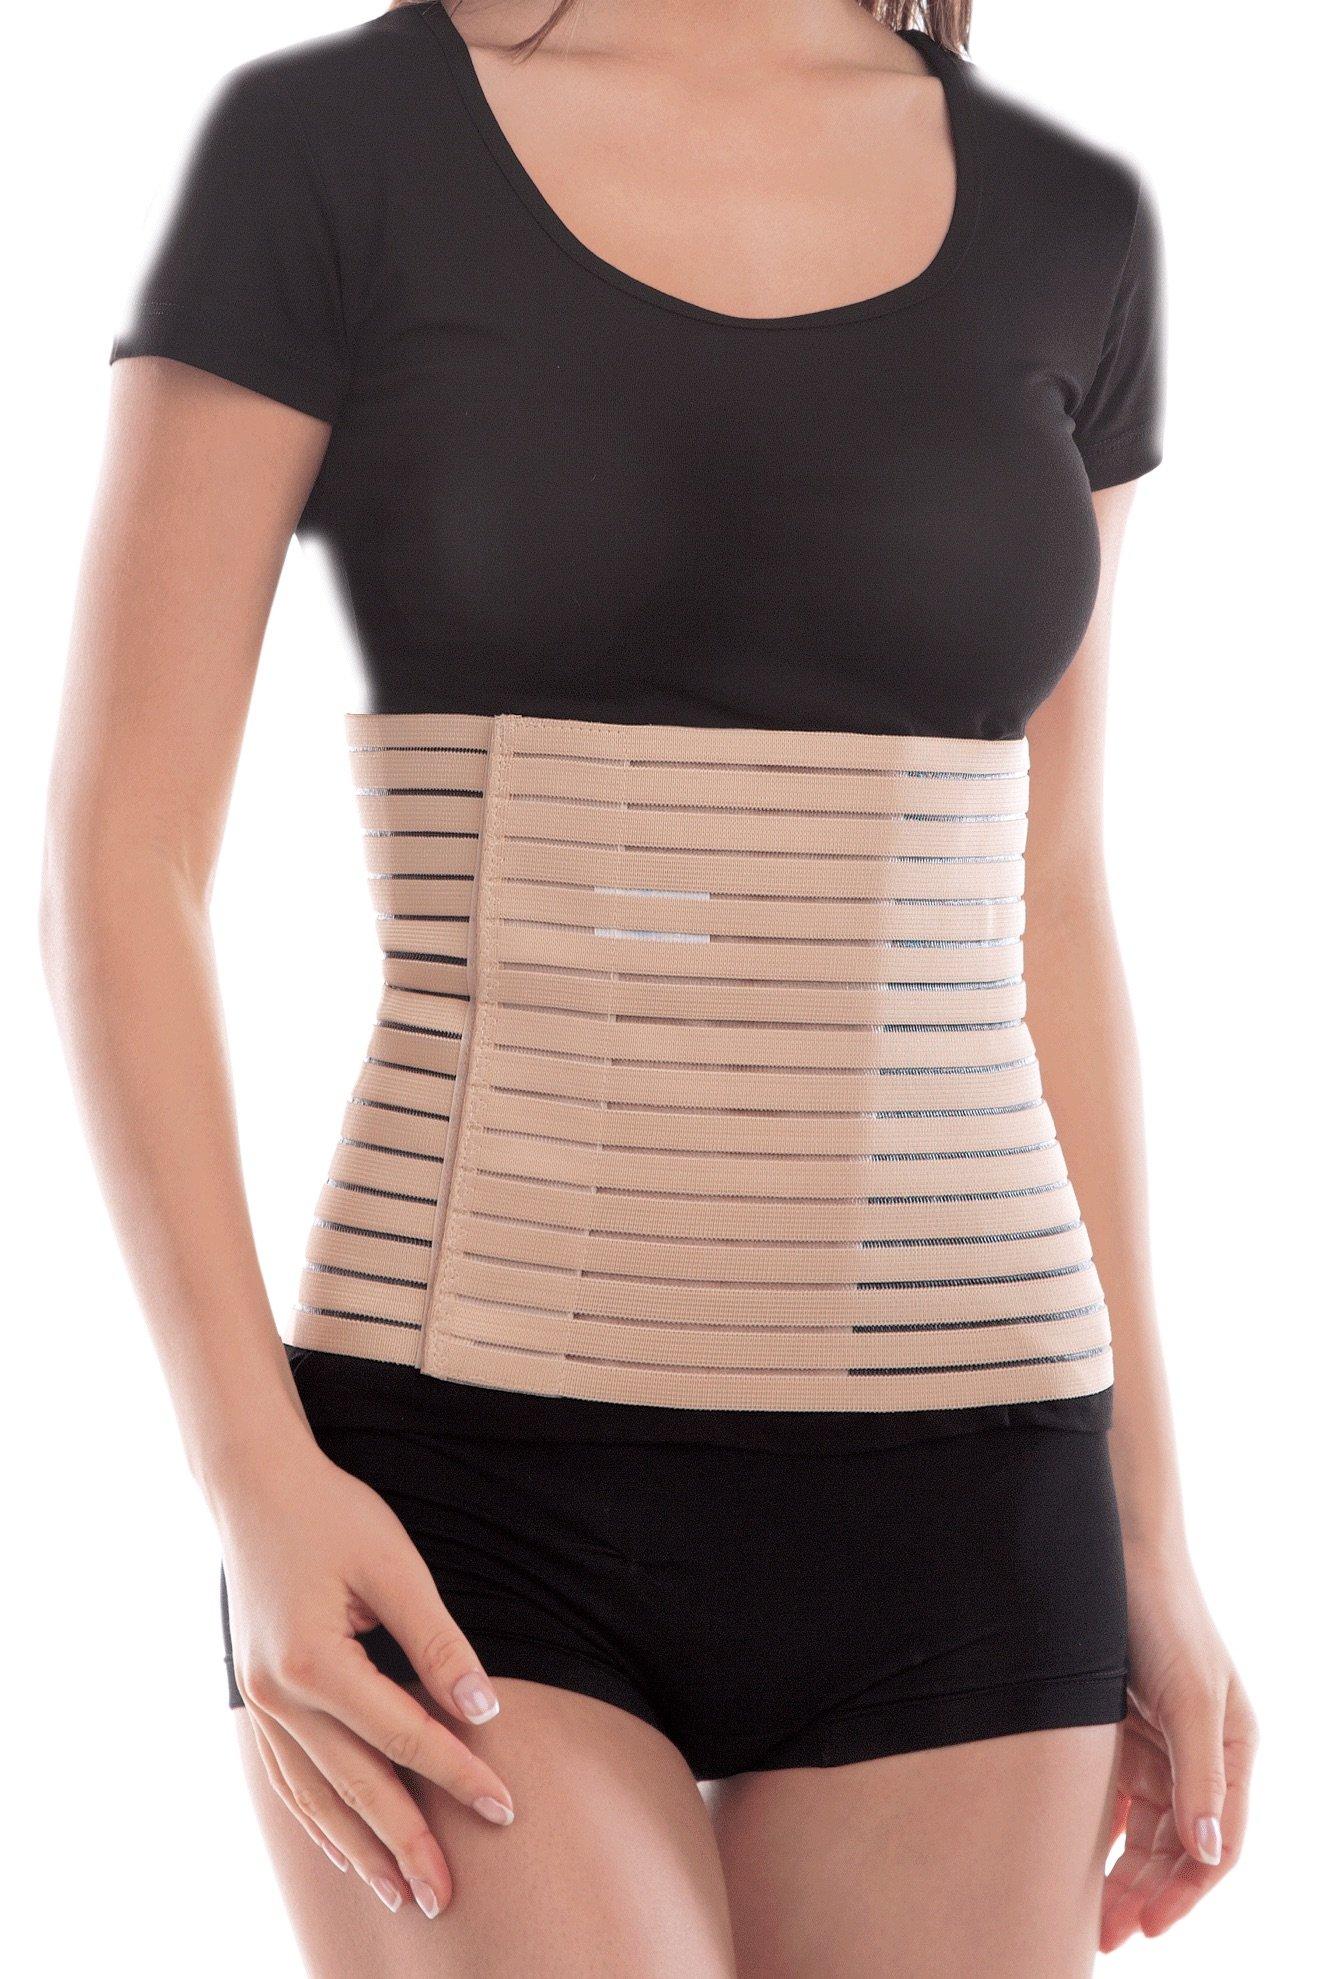 TOROS-Group Breathable 9'' Elastic Postpartum Girdle/Postoperative Abdominal Binder - Medium, Waist/Belly 32'' - 35½'' Beige